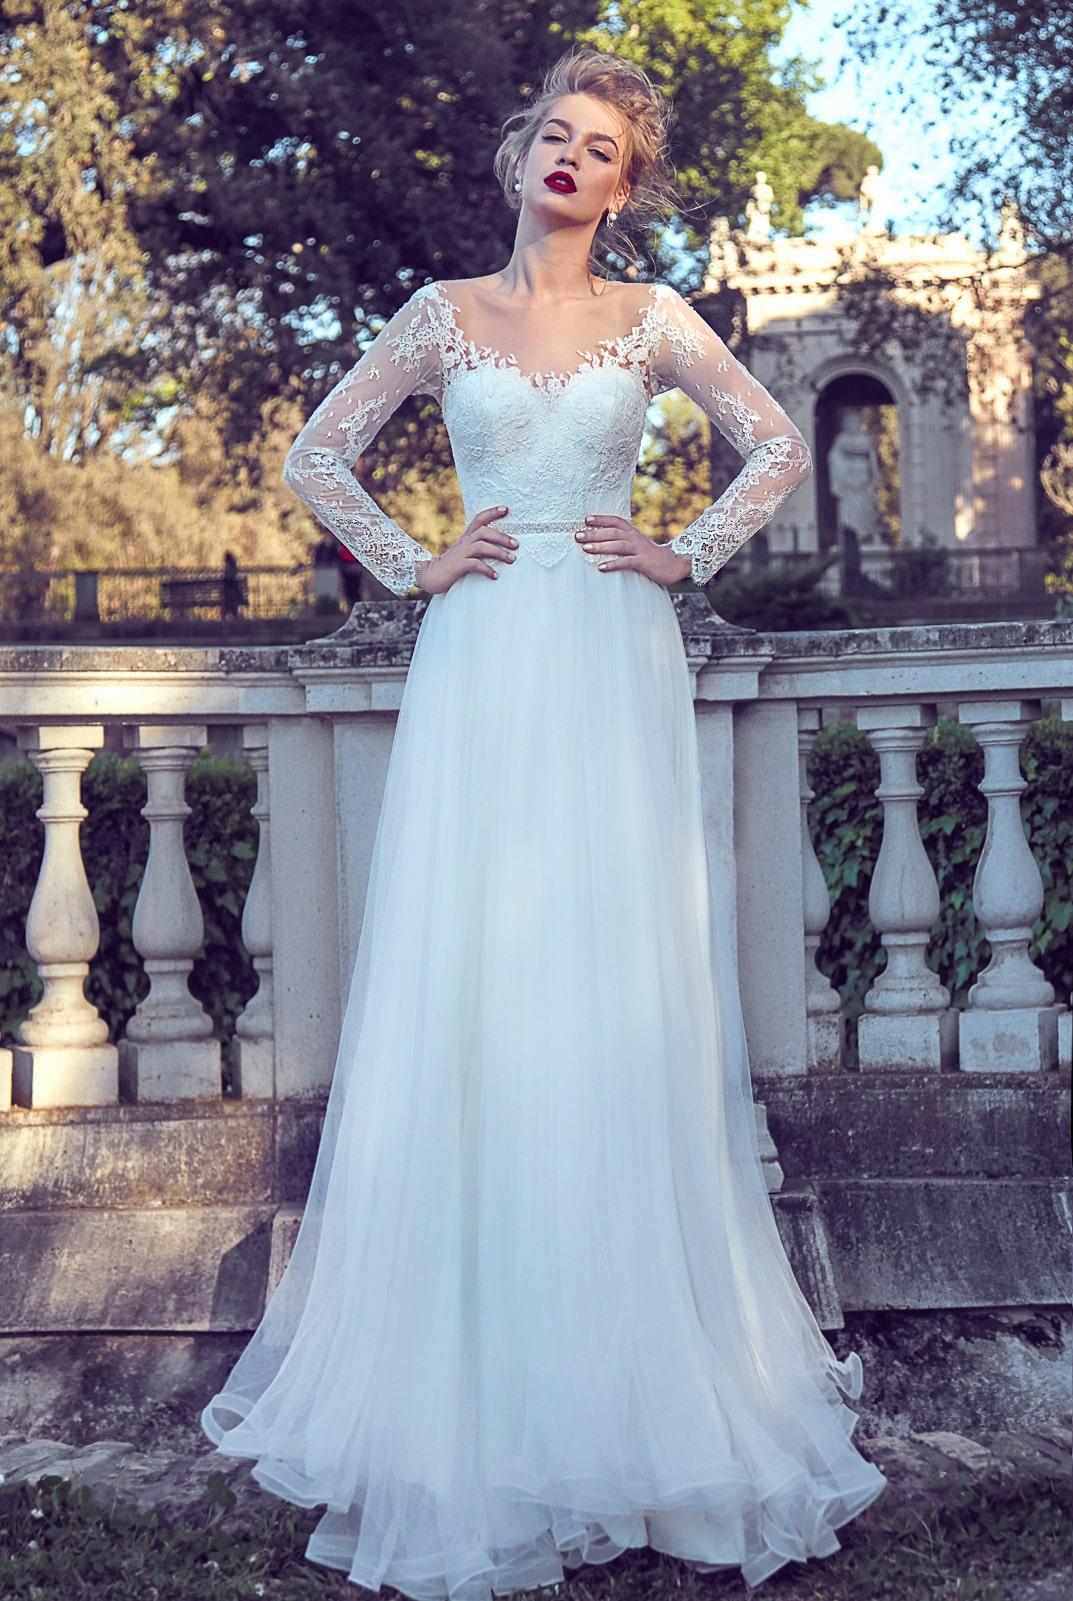 Nieve Model - Colectia Roma - Adora Sposa